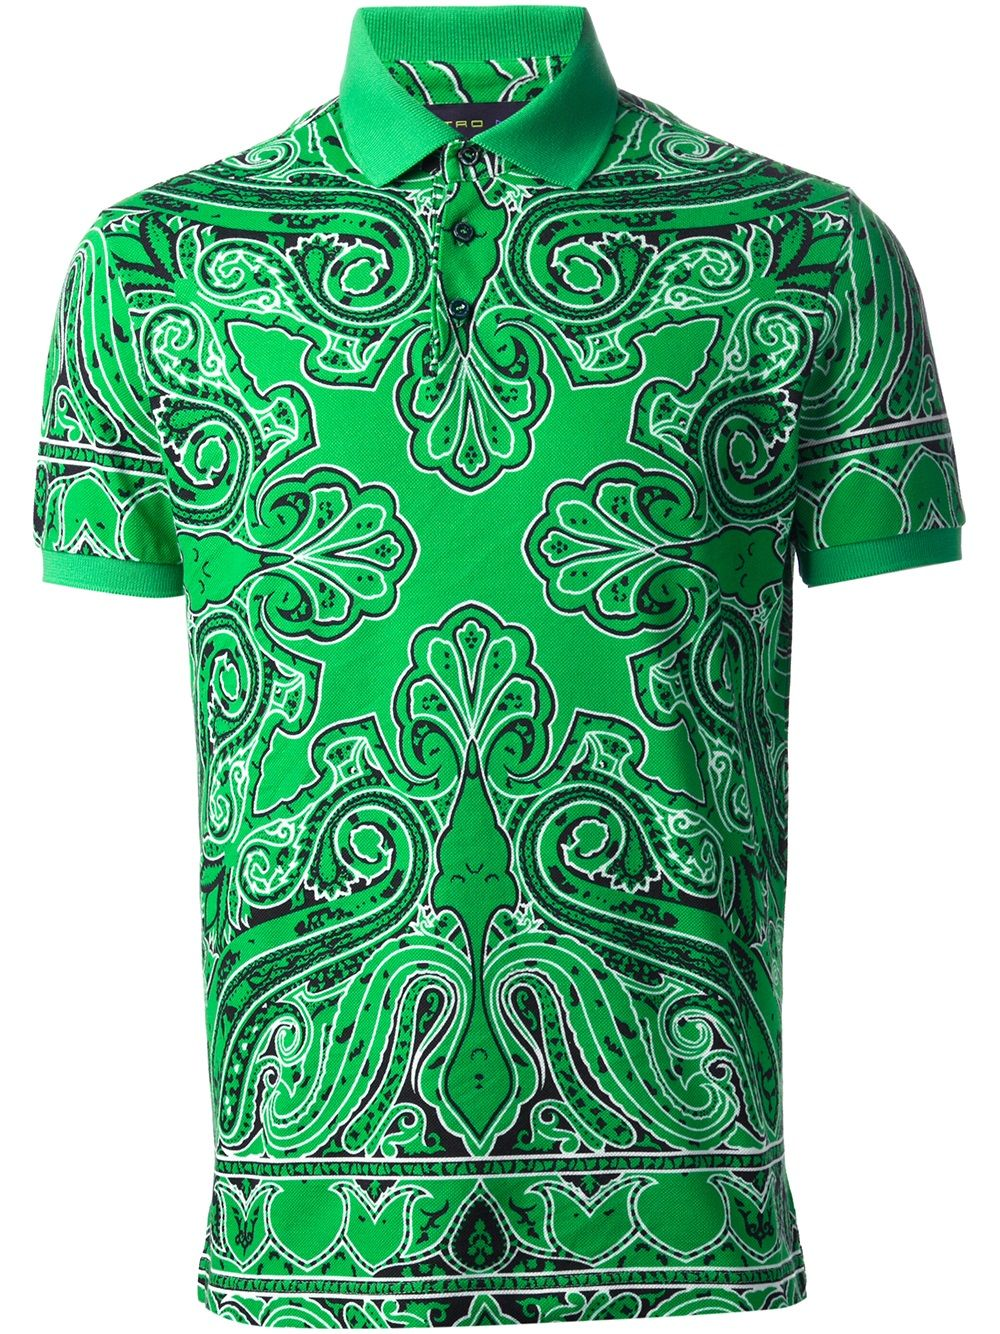 0802fc71eb Etro Camisa Polo Verde Estampada - Fashion Clinic - Farfetch.com ...